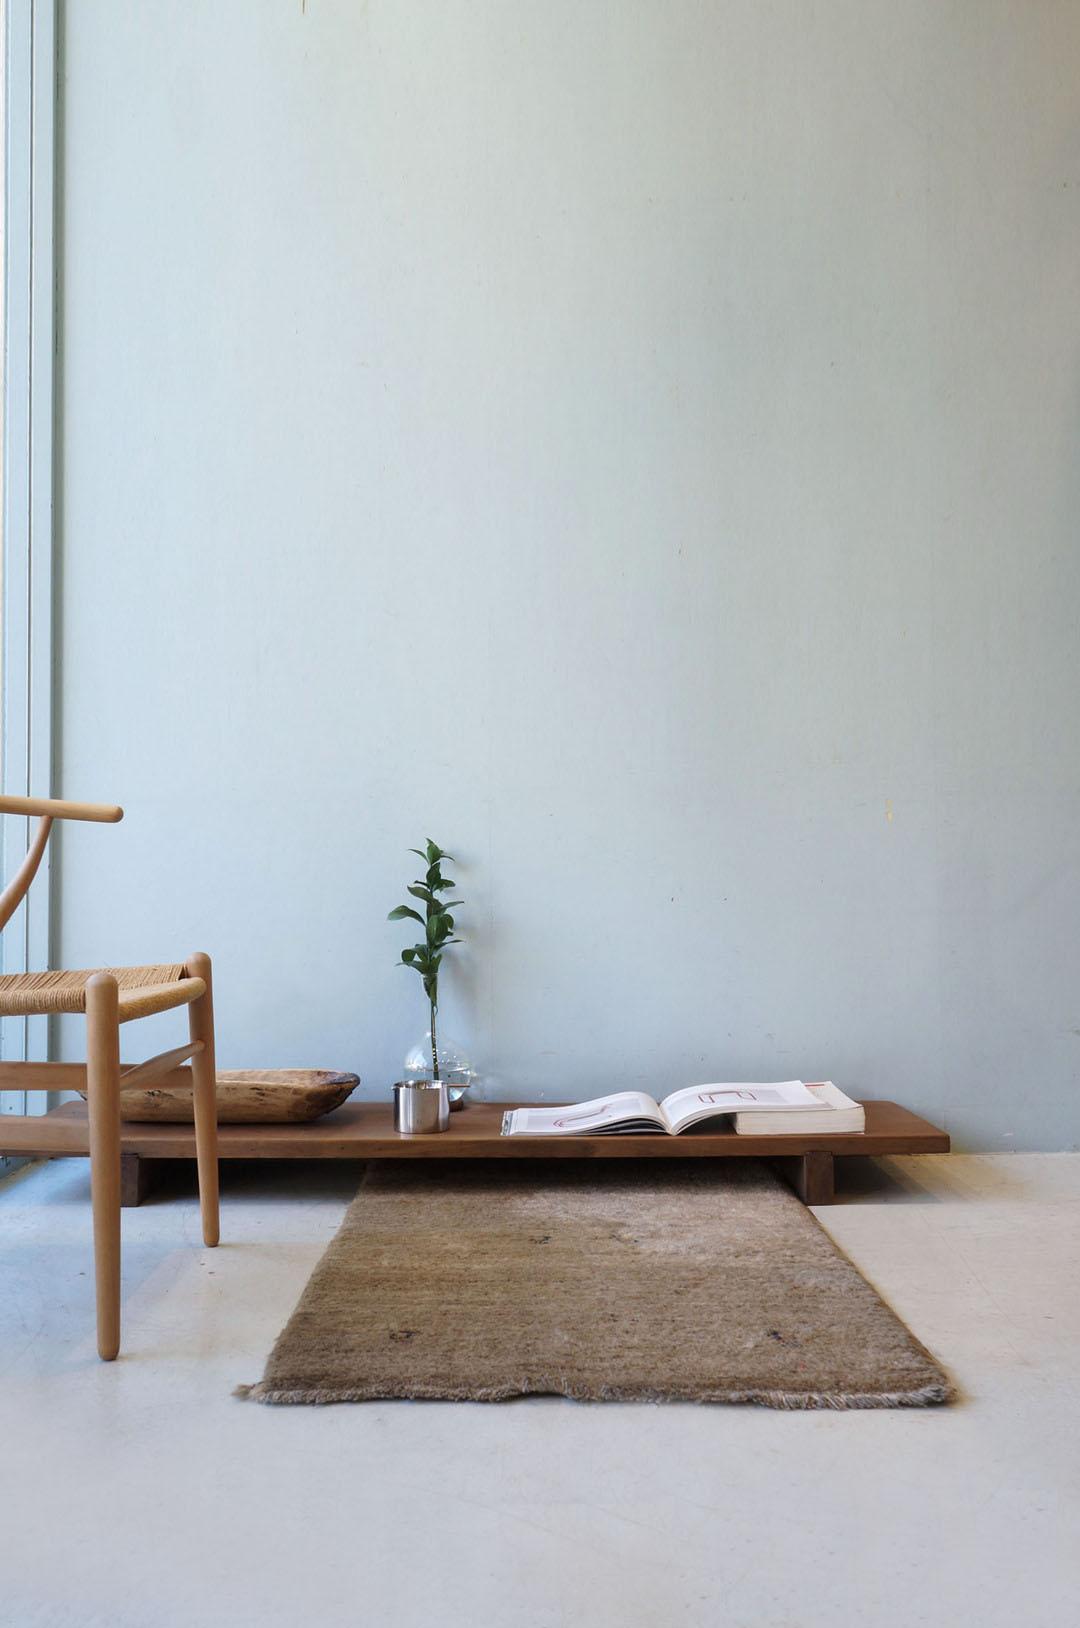 Japanese Vintage Wooden Low Board/ジャパンヴィンテージ ローボード 裁ち台 テレビ台 引き出し 古道具 時代家具 2